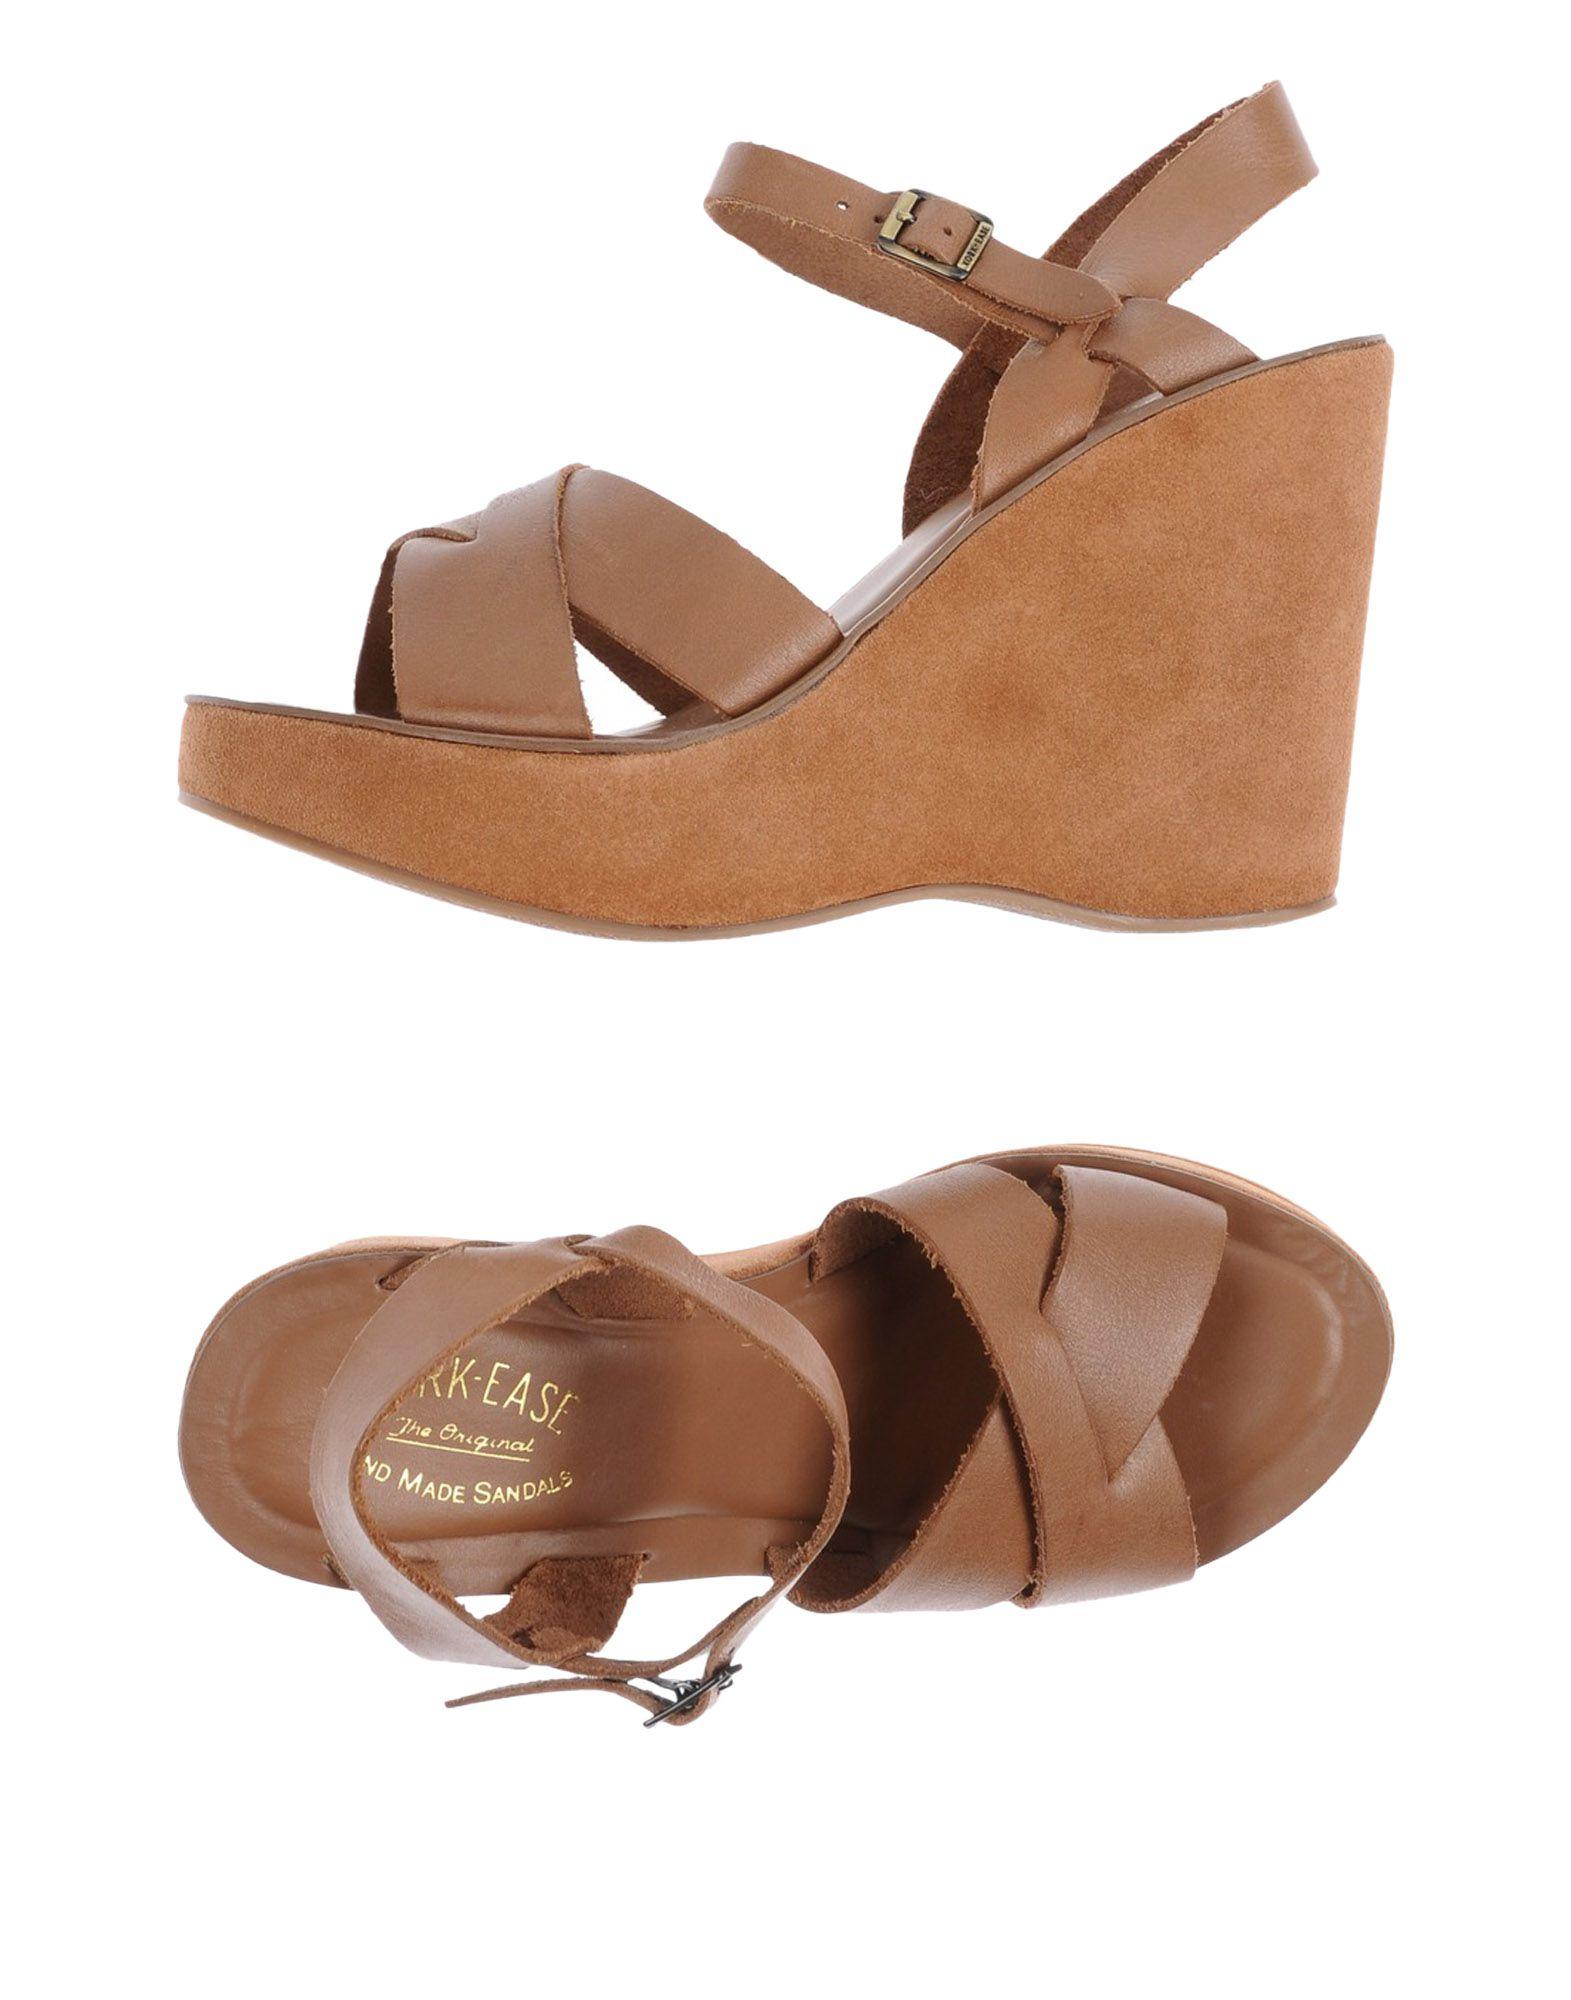 KORKEASE Sandals in Light Brown